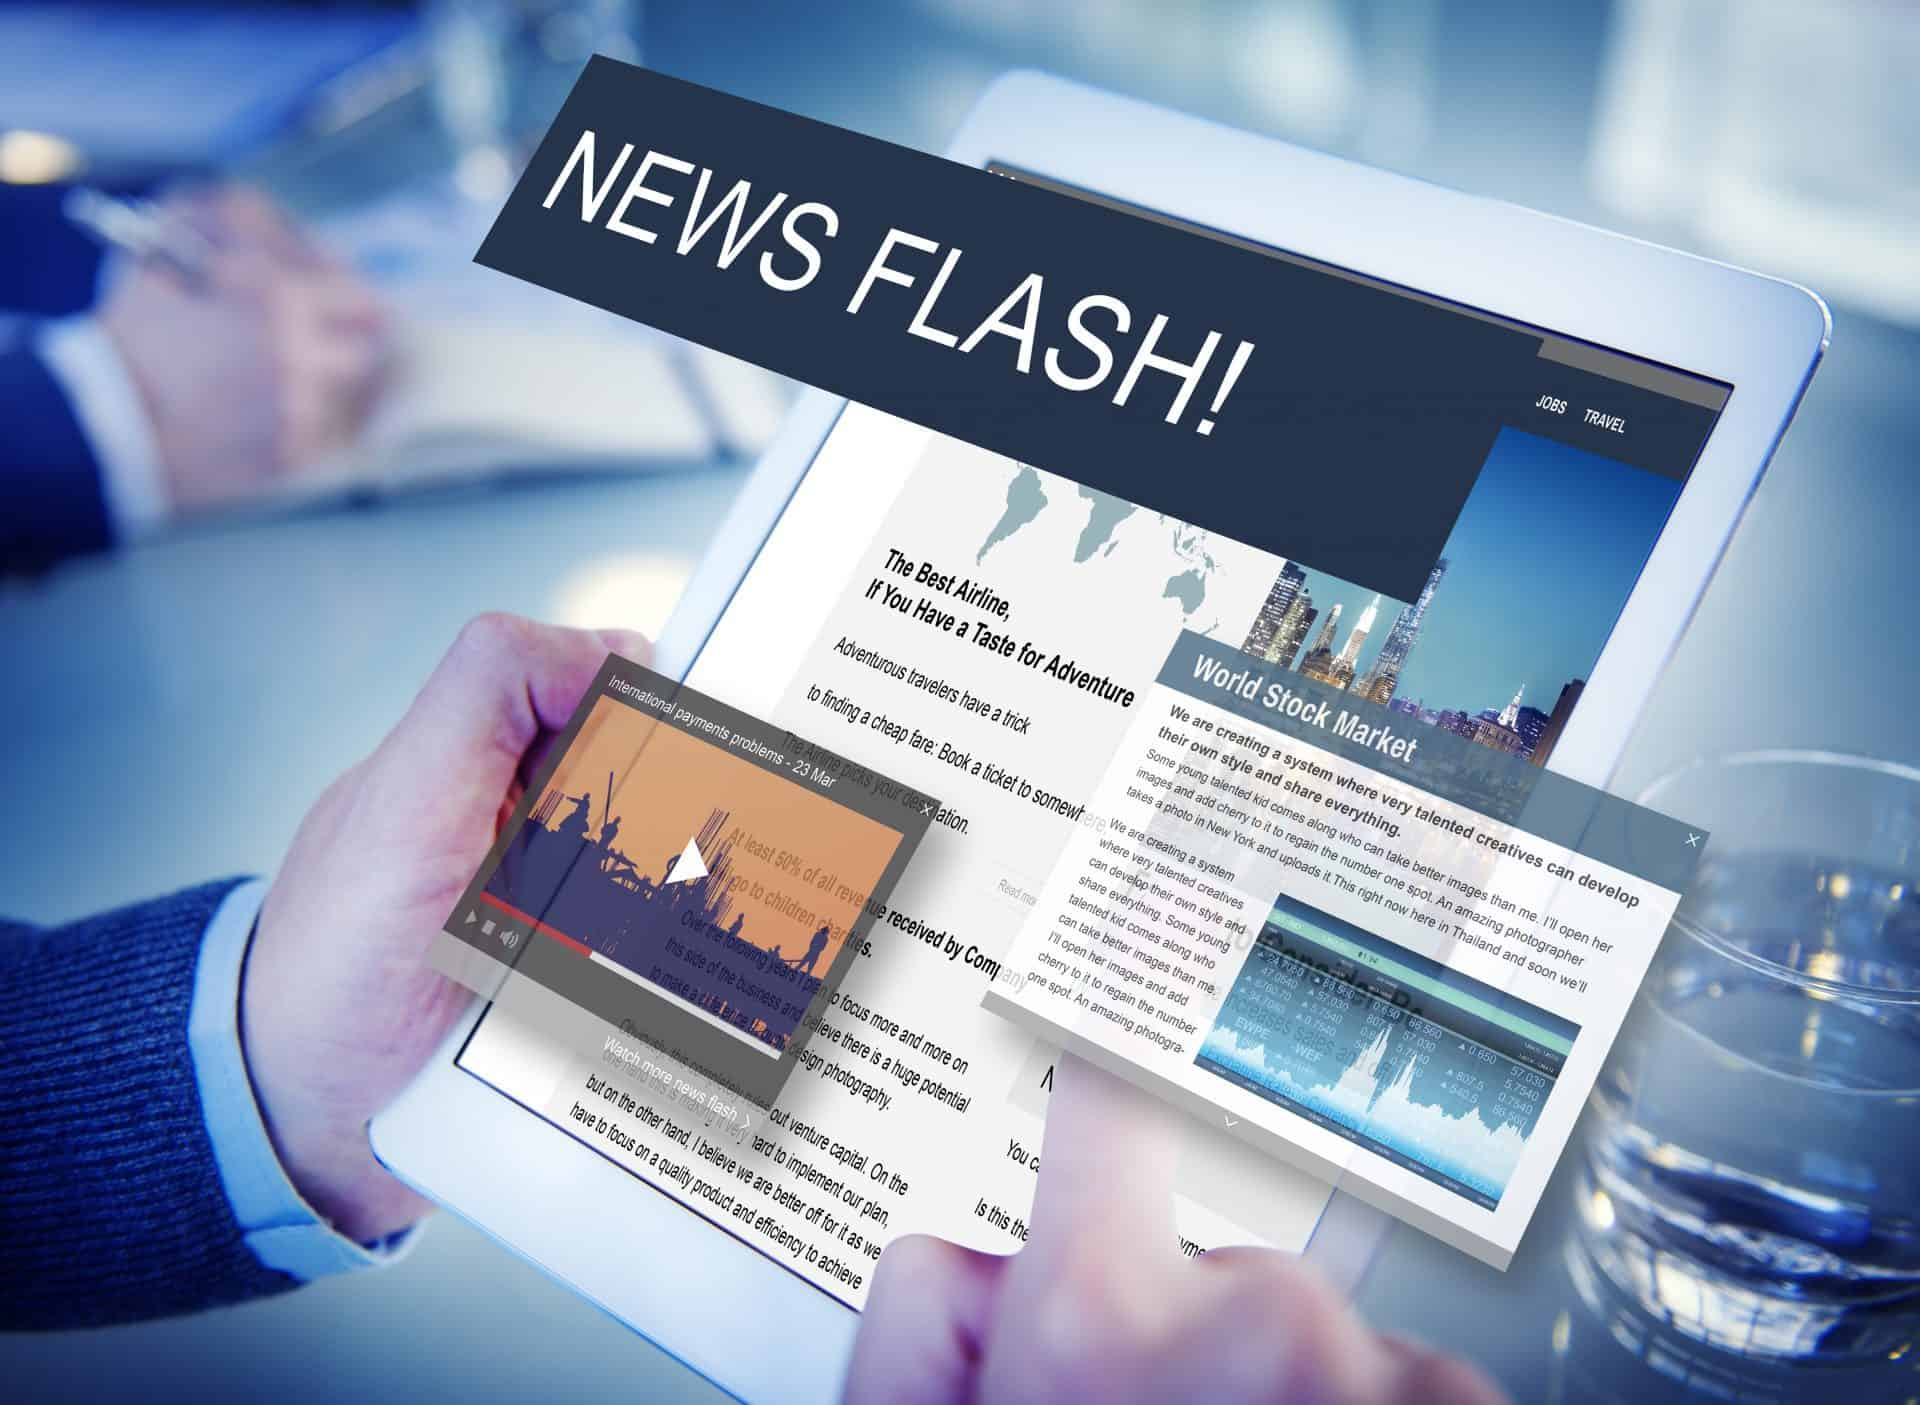 Denver News Flash